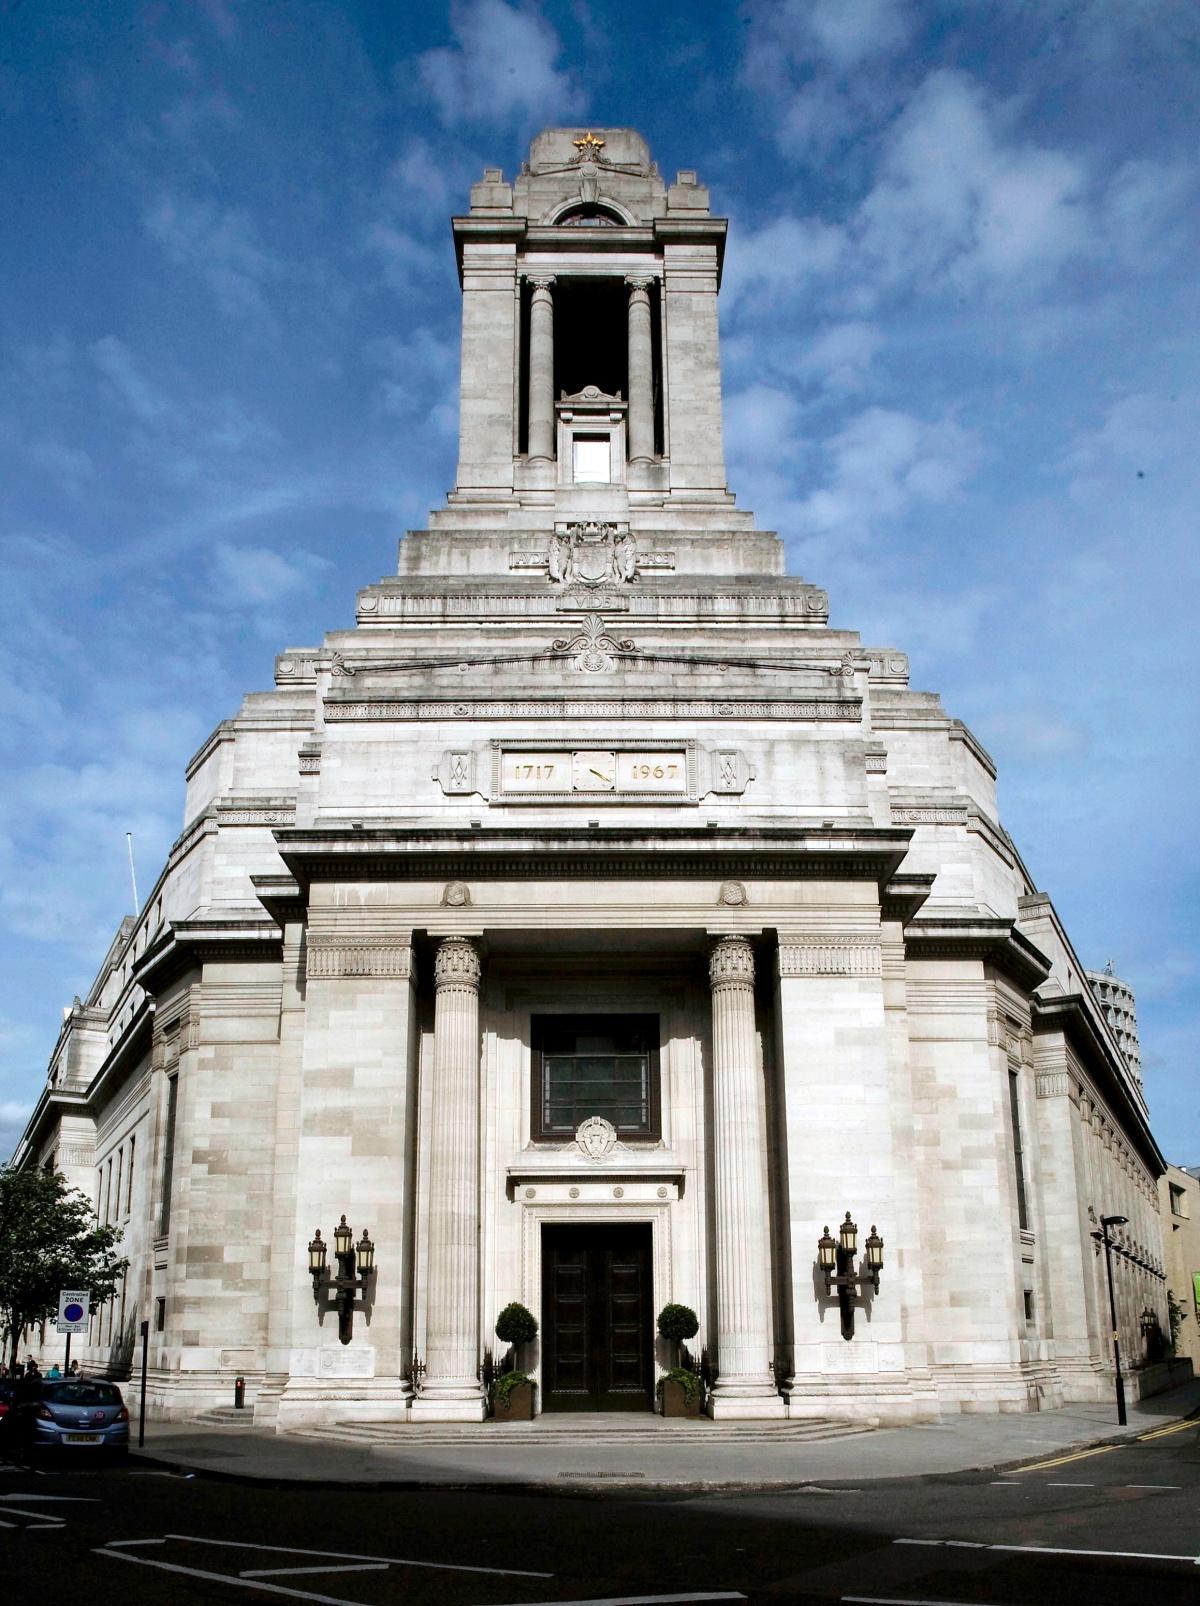 Freemasons%27 Hall%2c Covent Garden%2c London.jpg